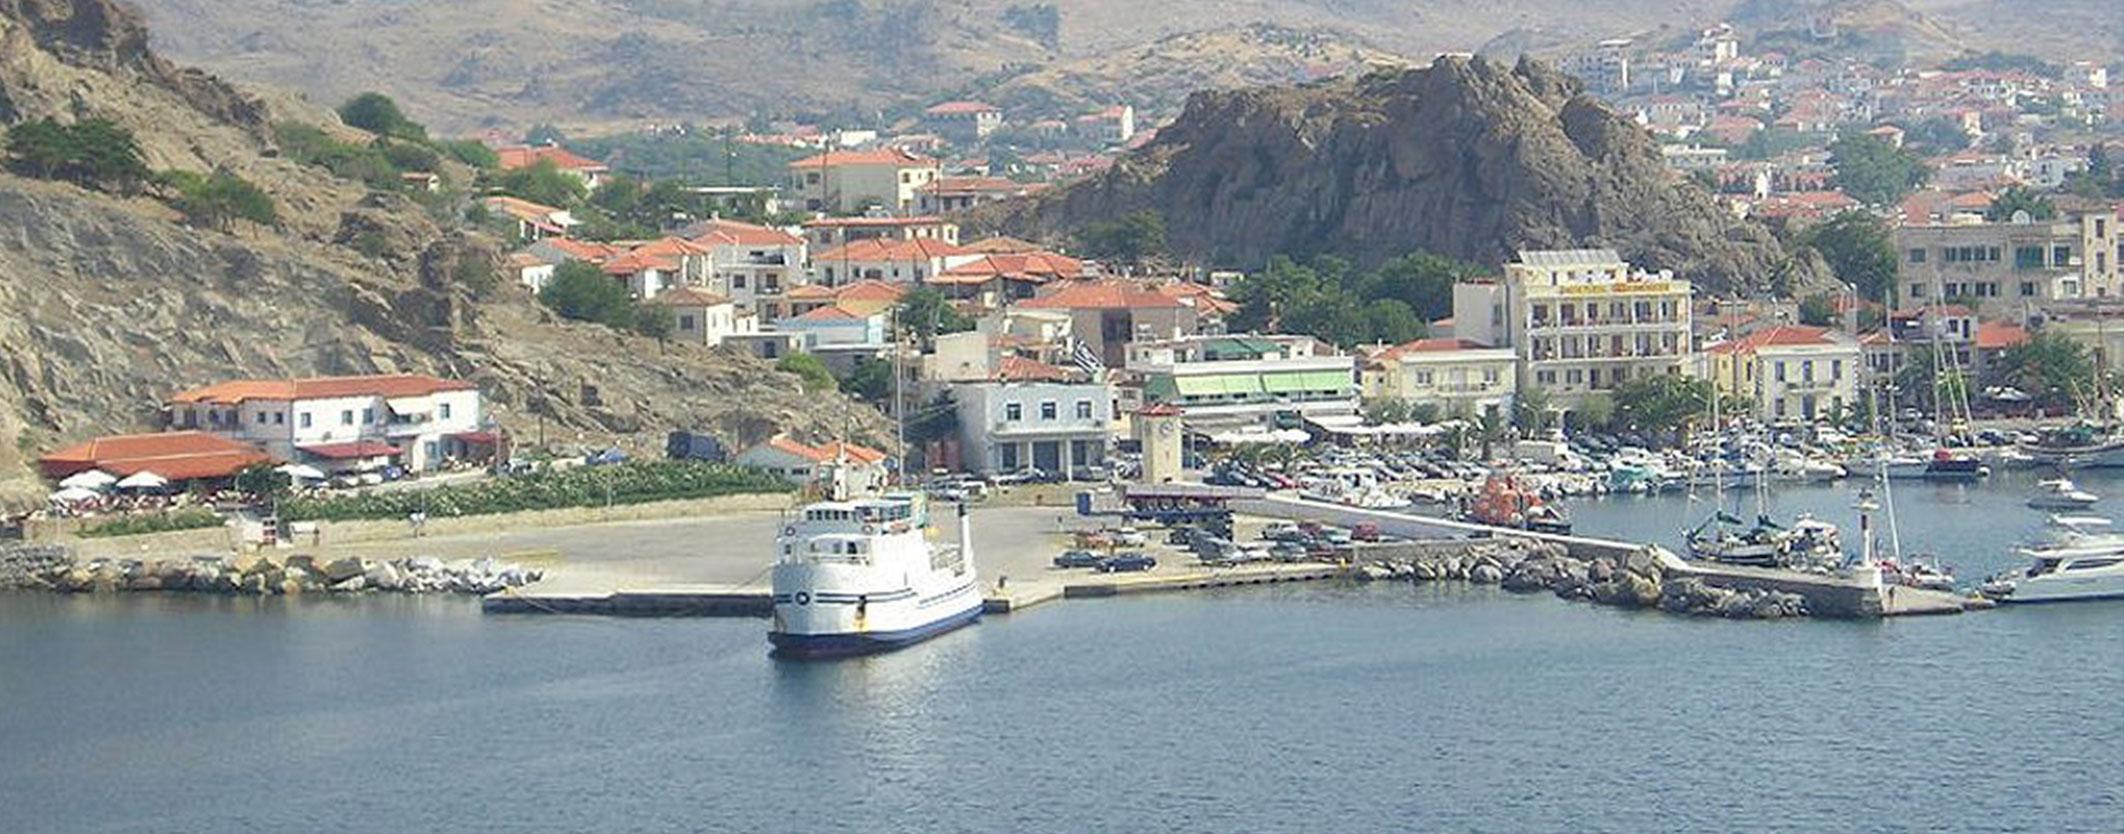 Port of Lemnos